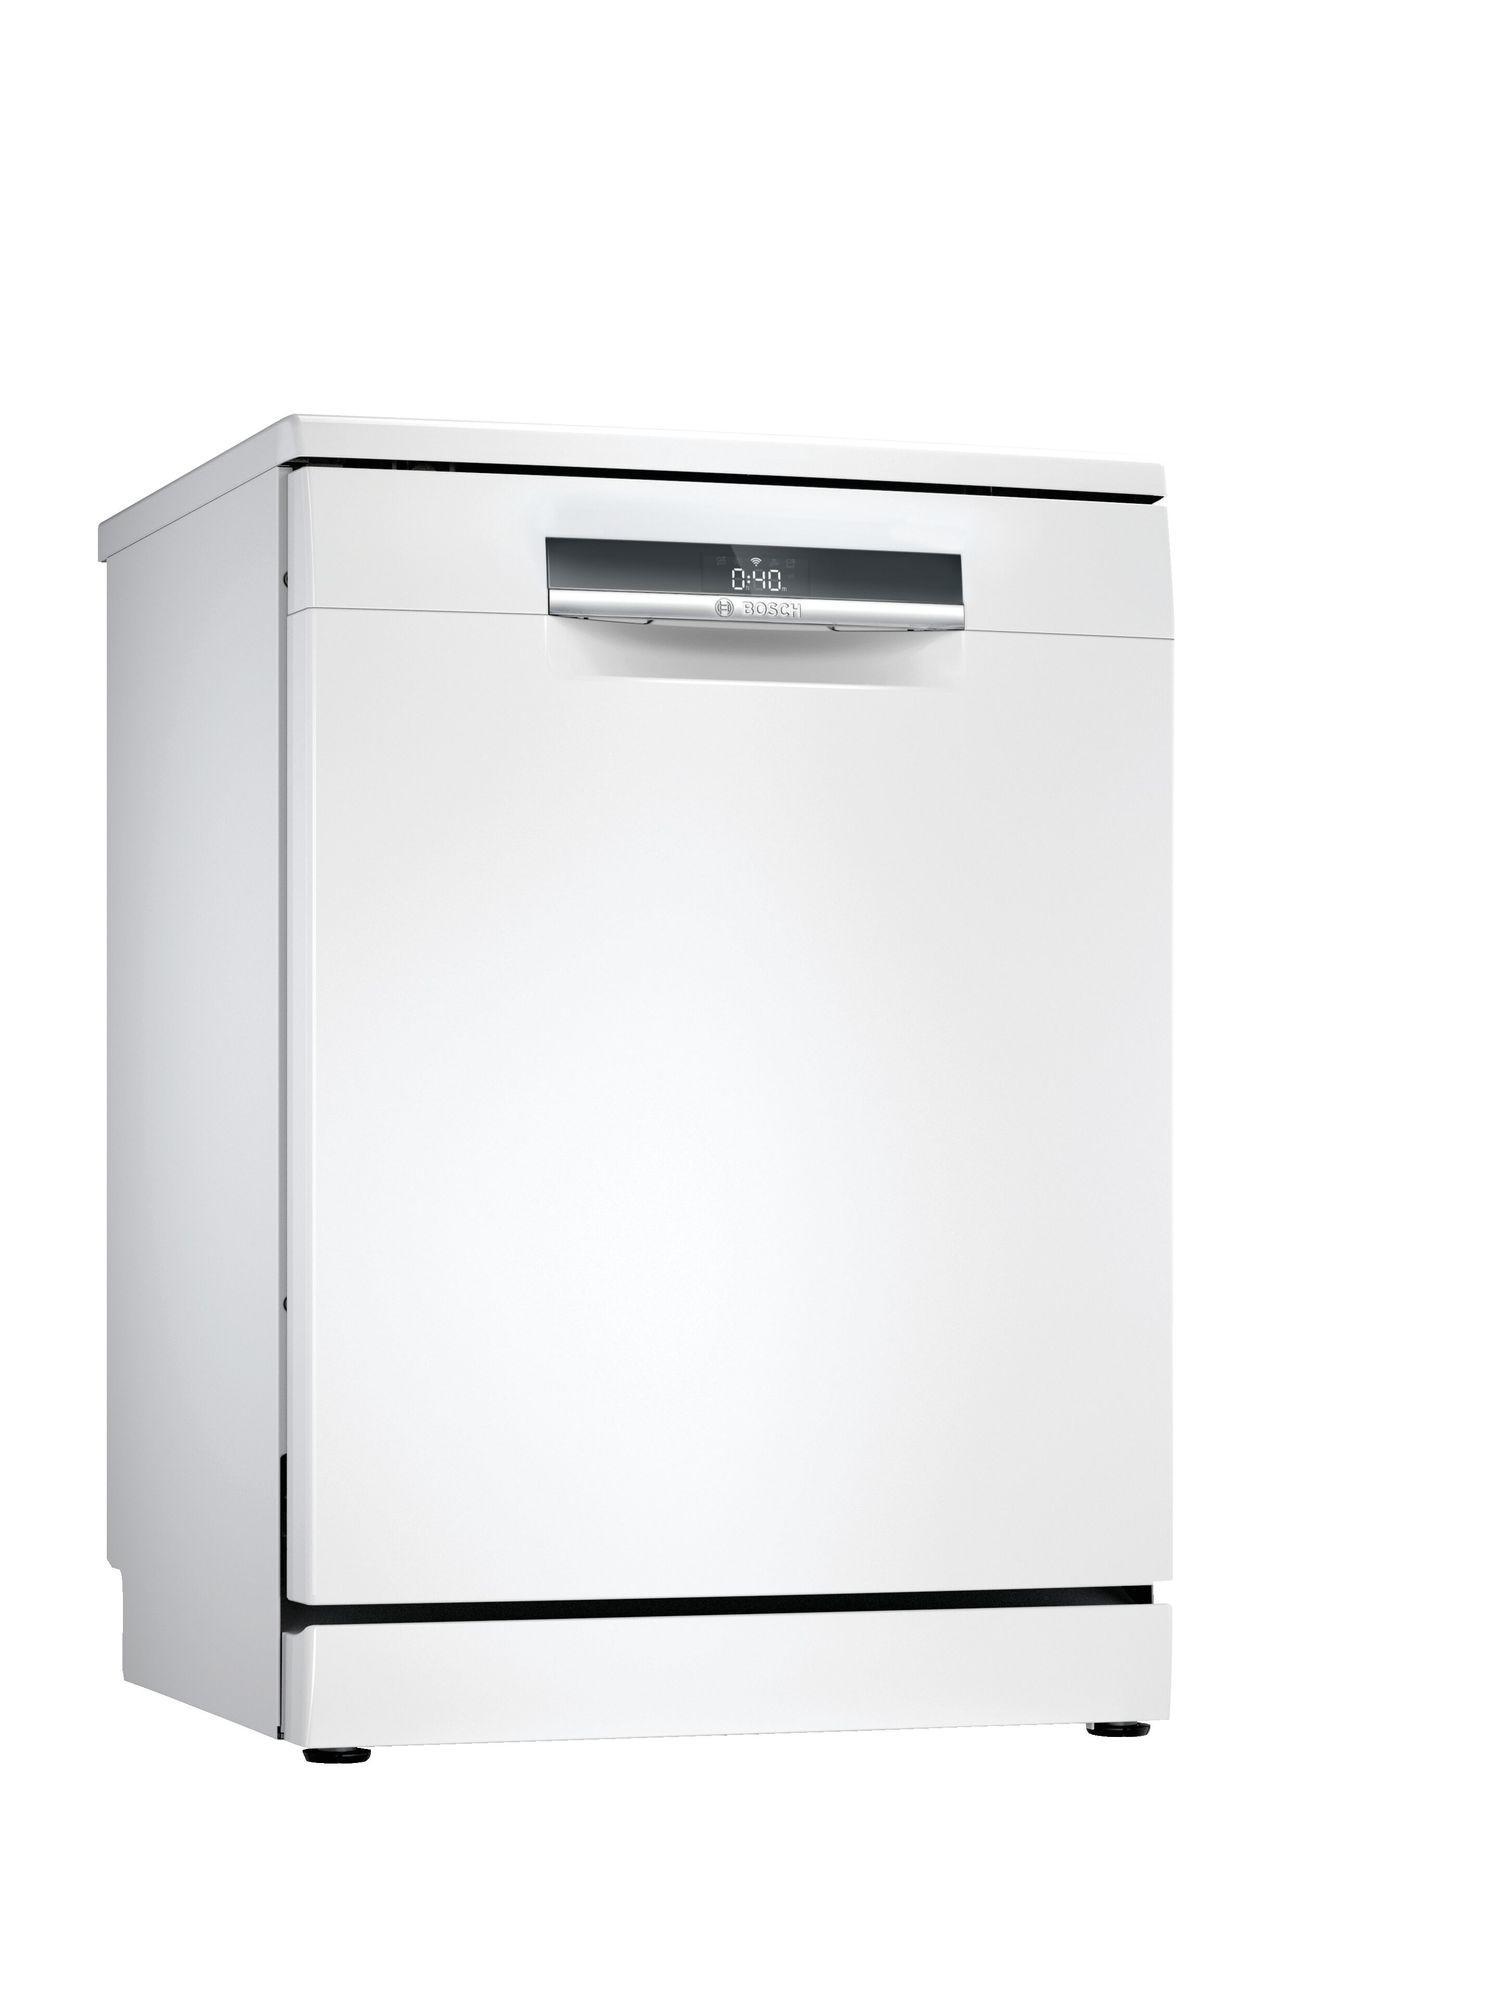 Image of Serie 6 SMS6EDW02G 60cm Standard Dishwasher   White